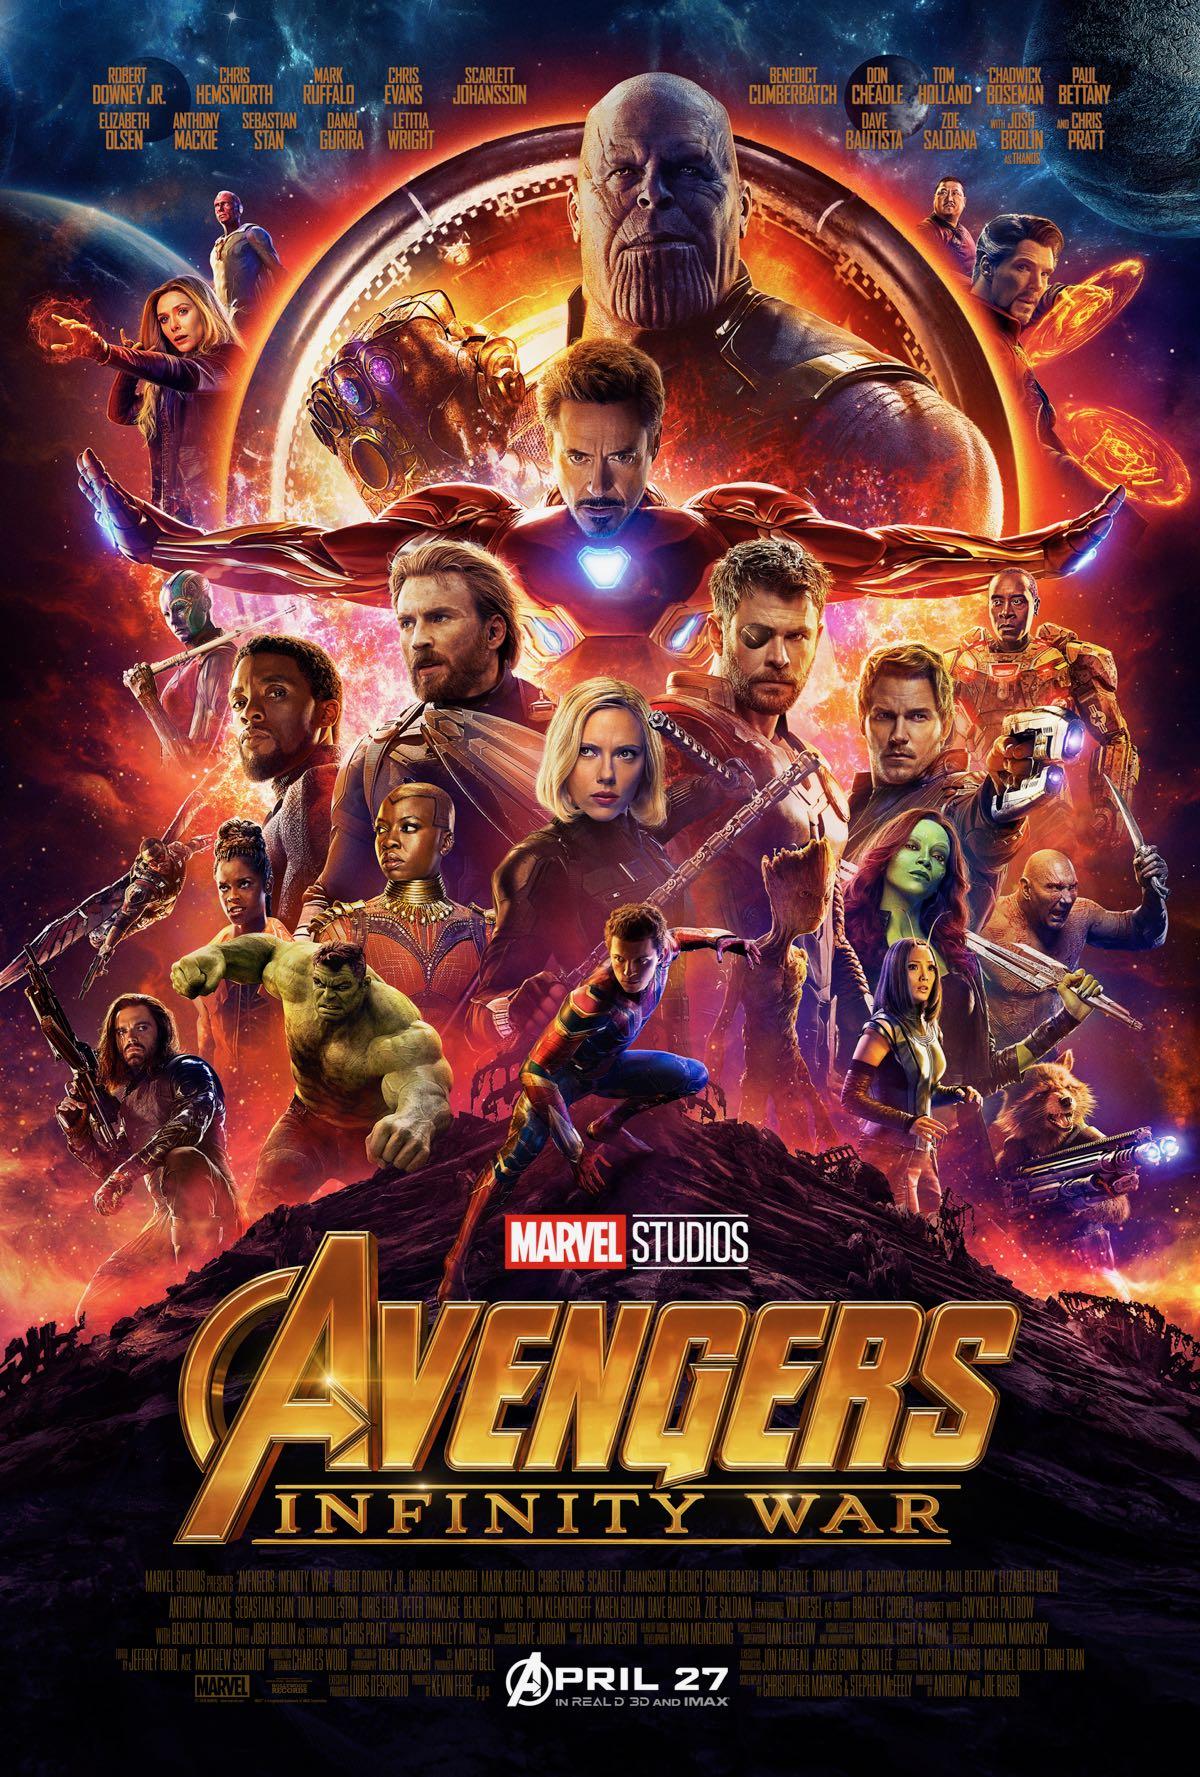 Reseña de la película - Avengers: Infinity War (2018)